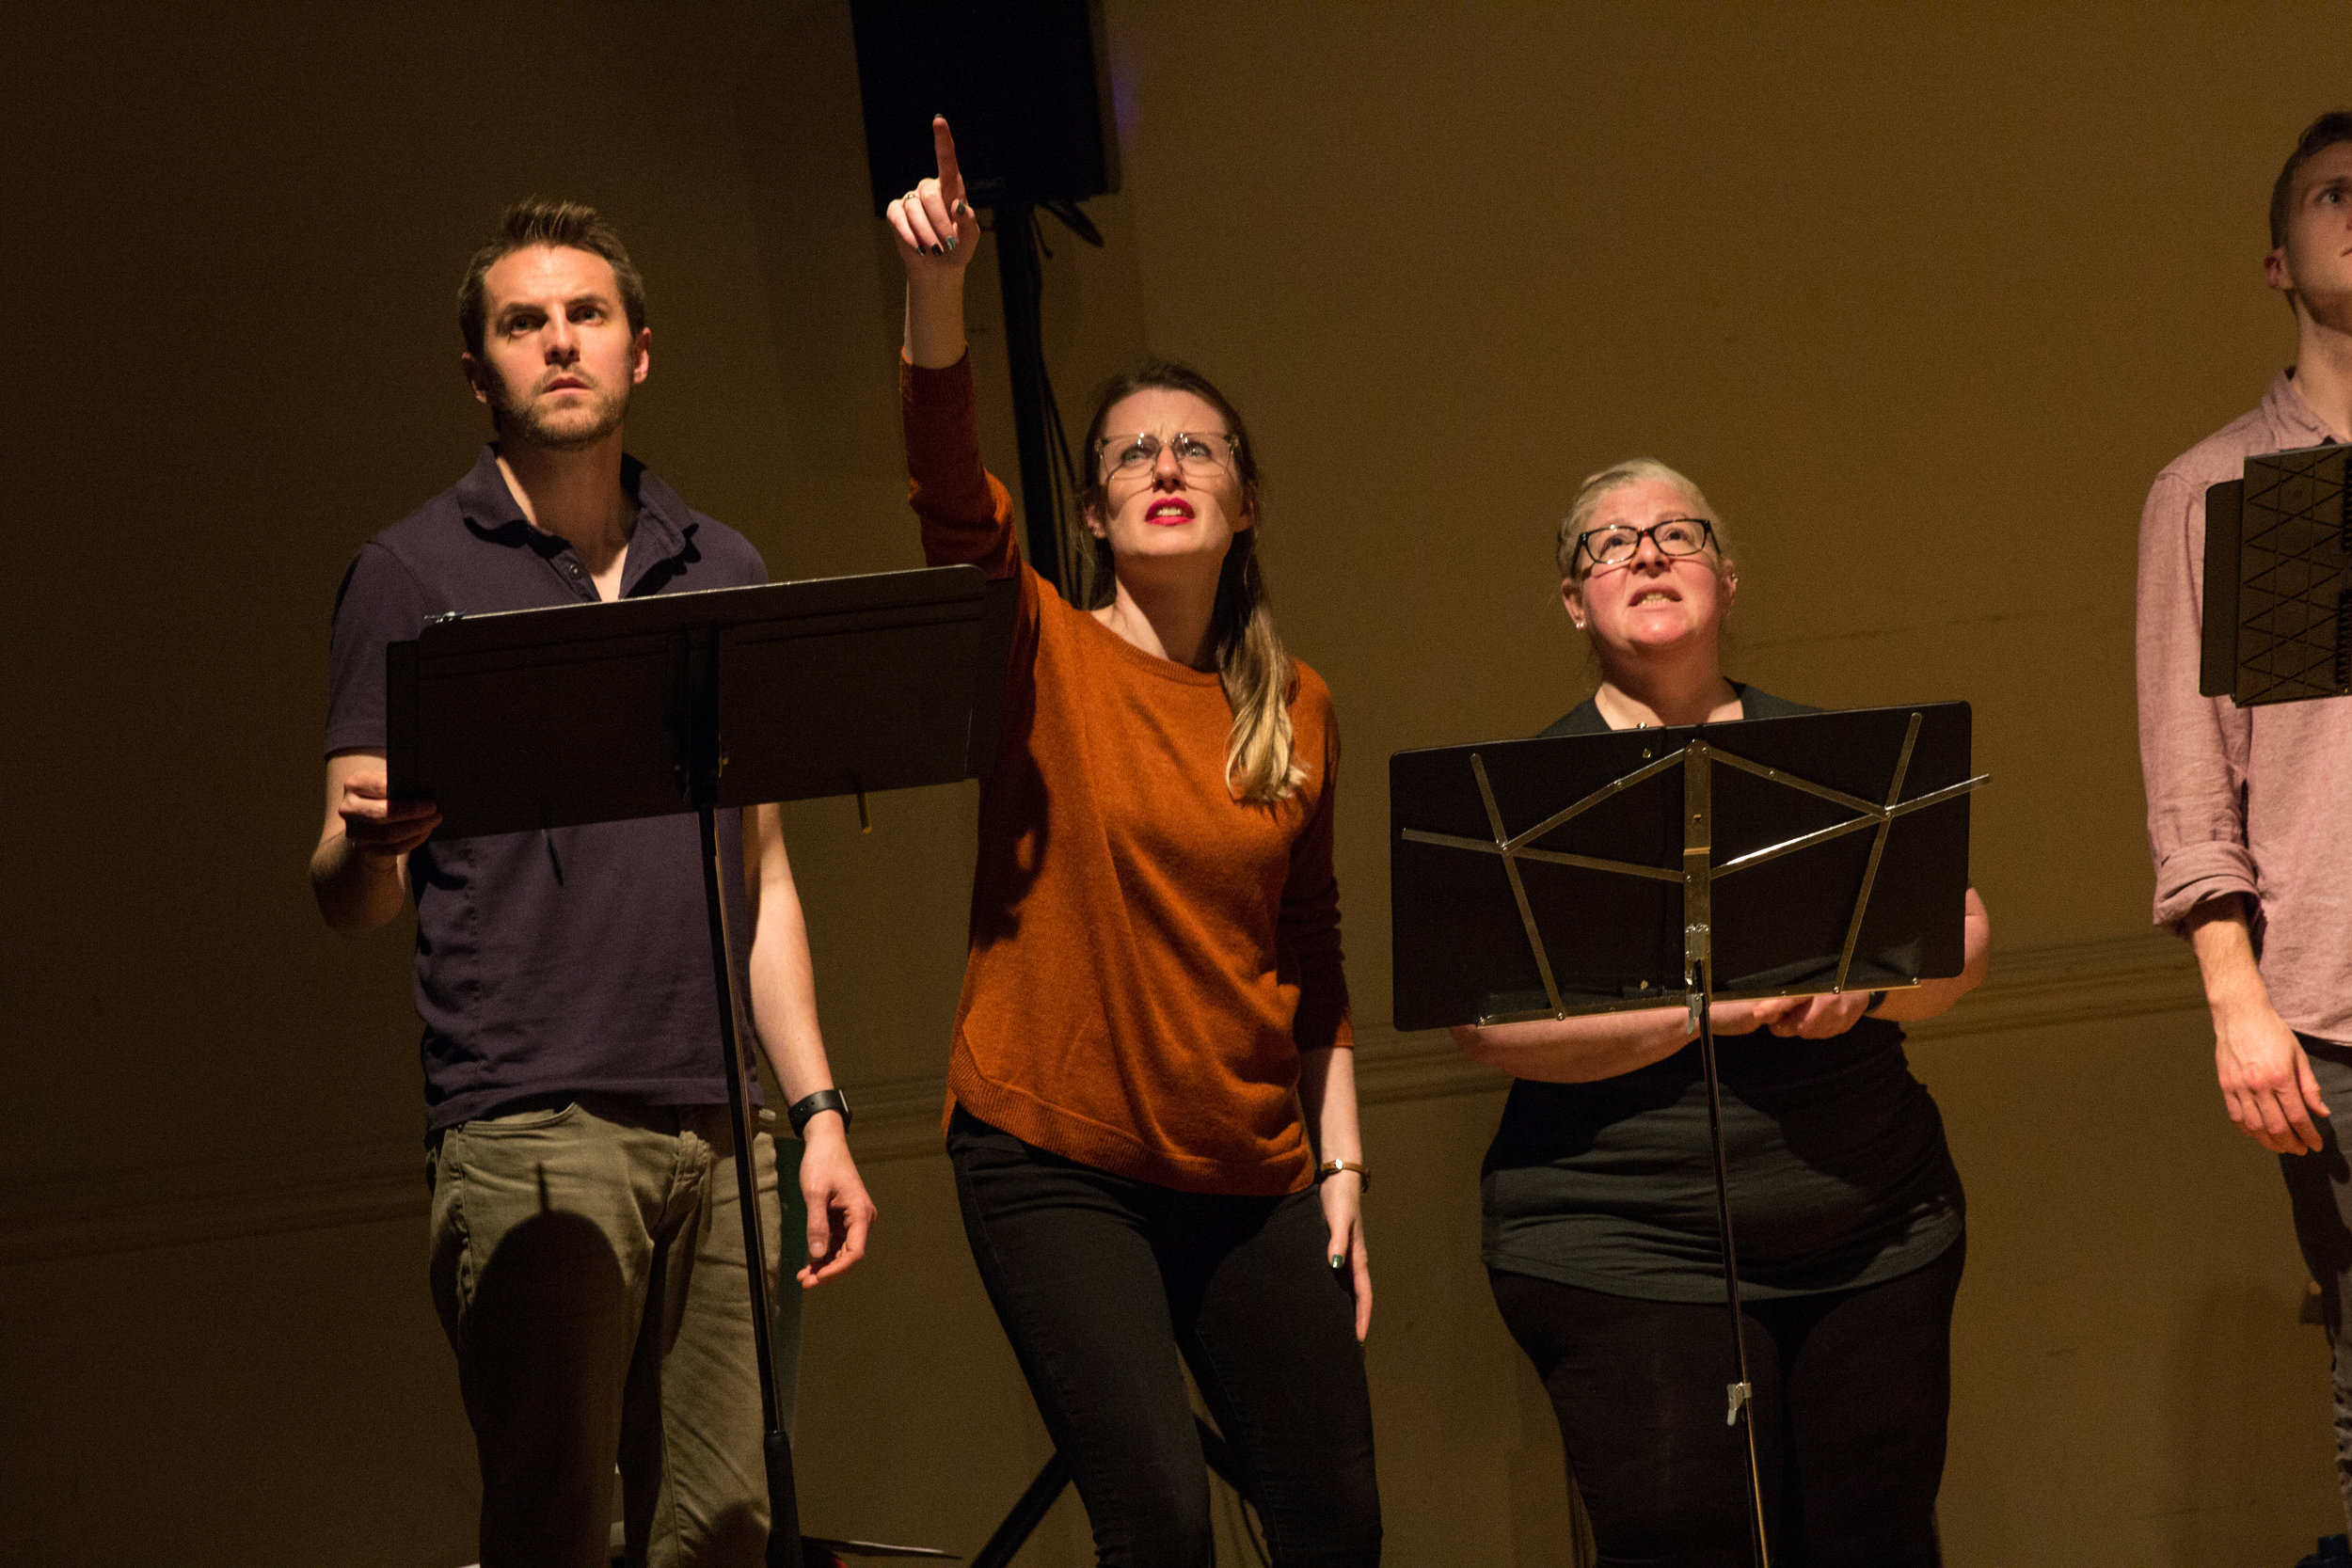 Ensemble members Matt Ryan, Louise Hamill, and Lynn Wilcott